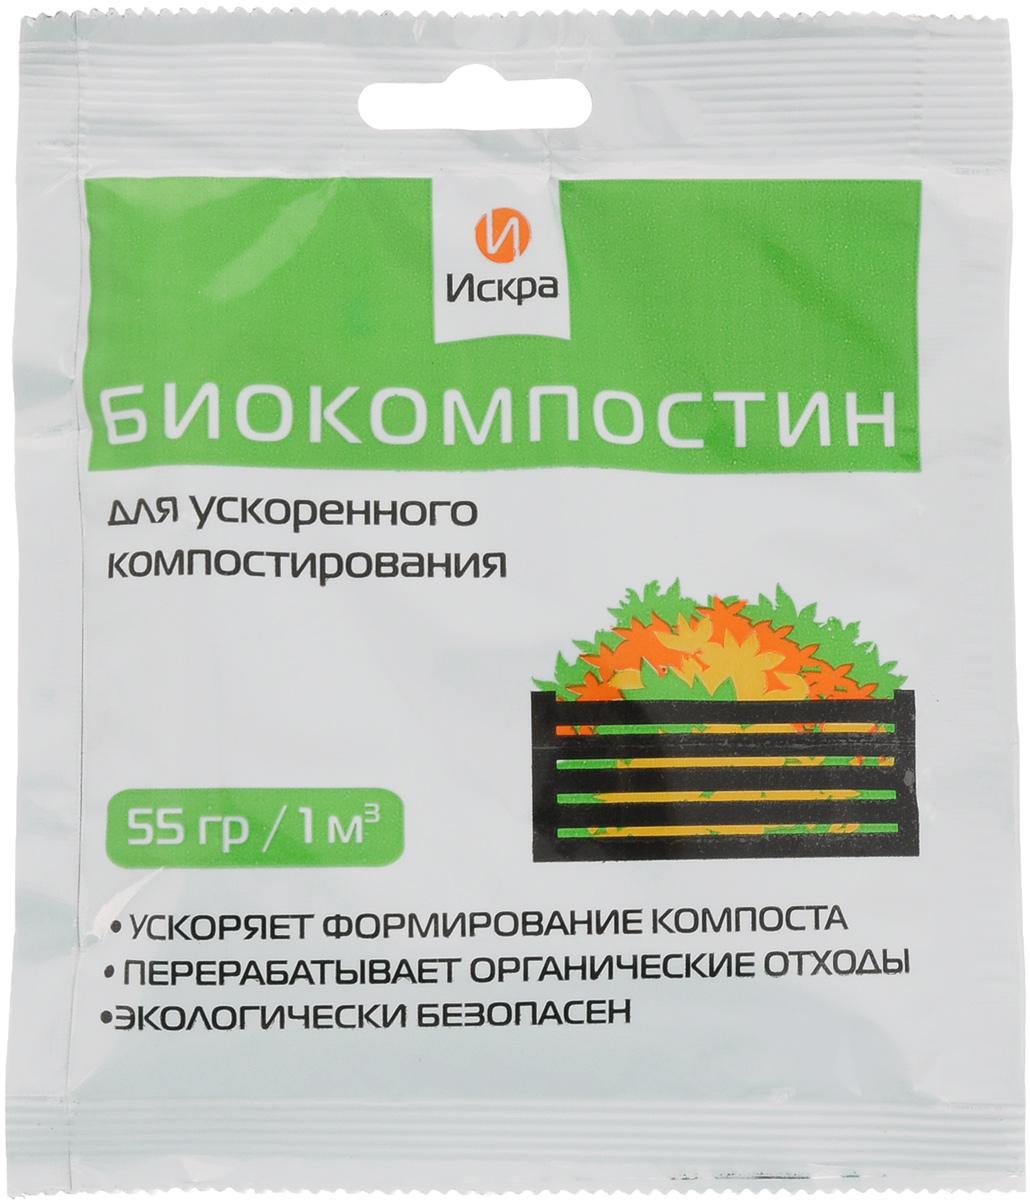 Биокомпостин Искра, 55 г биокомпостин искра 55г